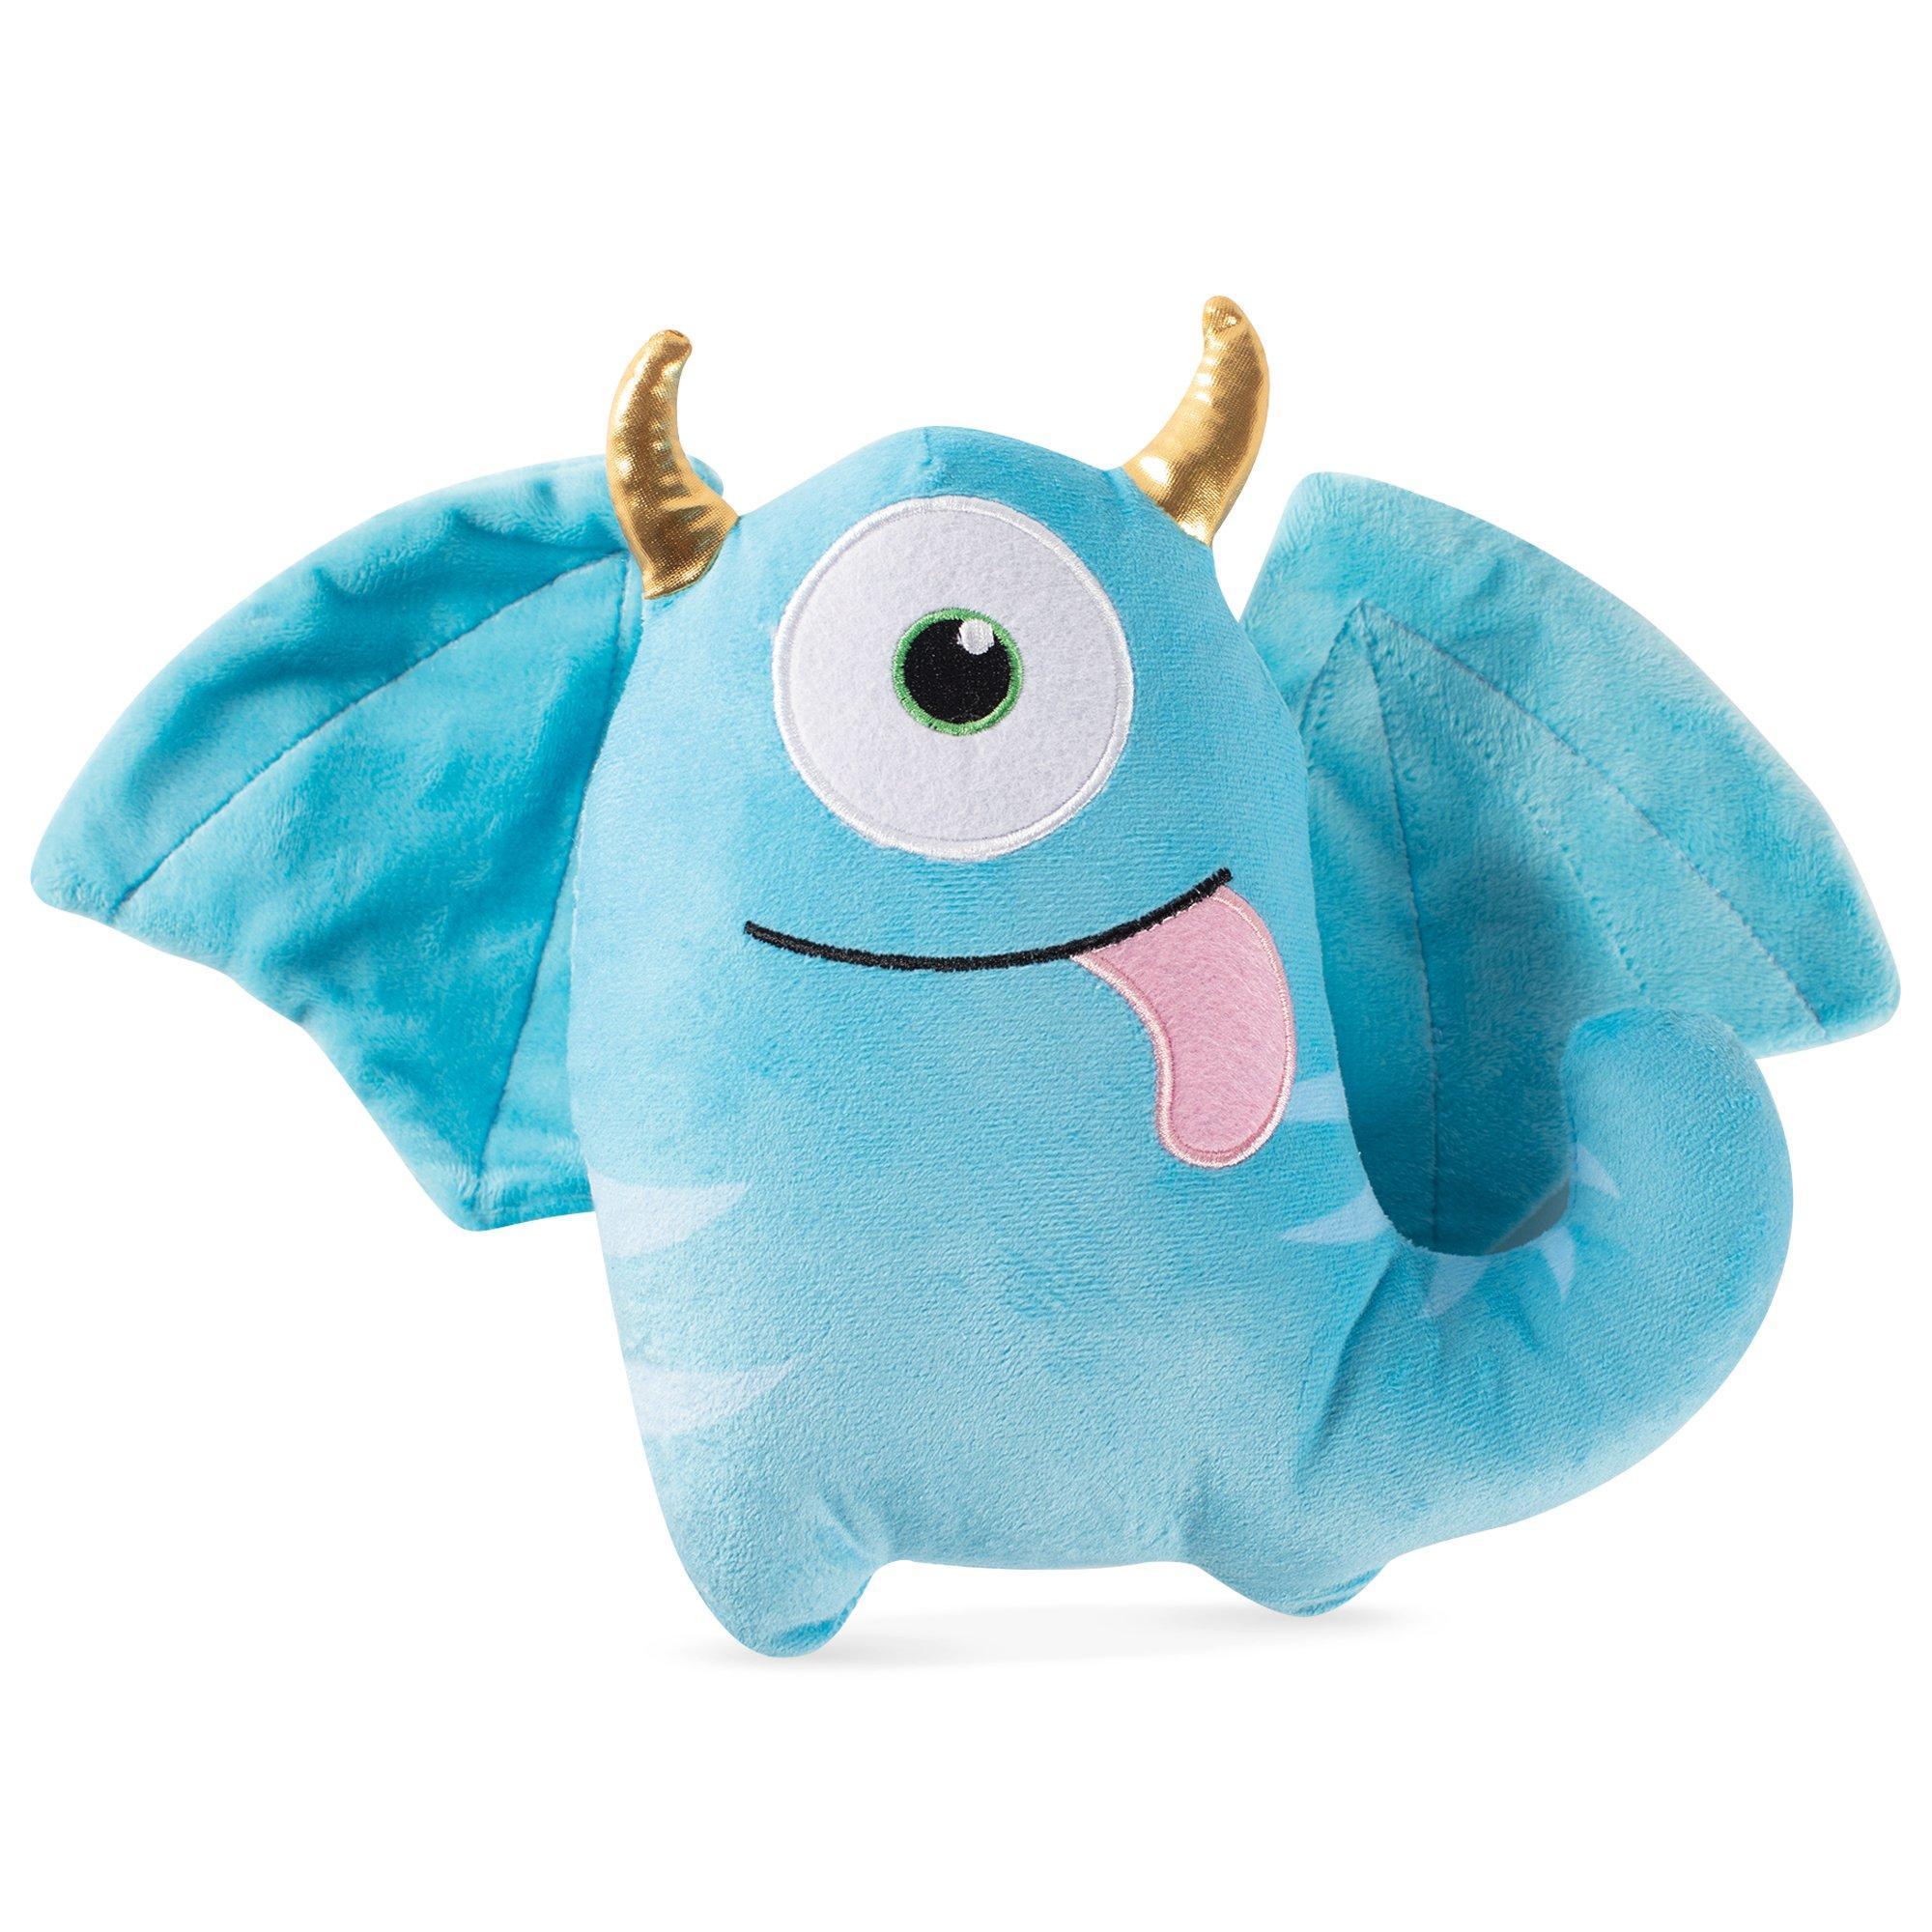 Pet Shop by Fringe Studio Blaze, the One Eyed Monster Plush Squeaker Dog Toy